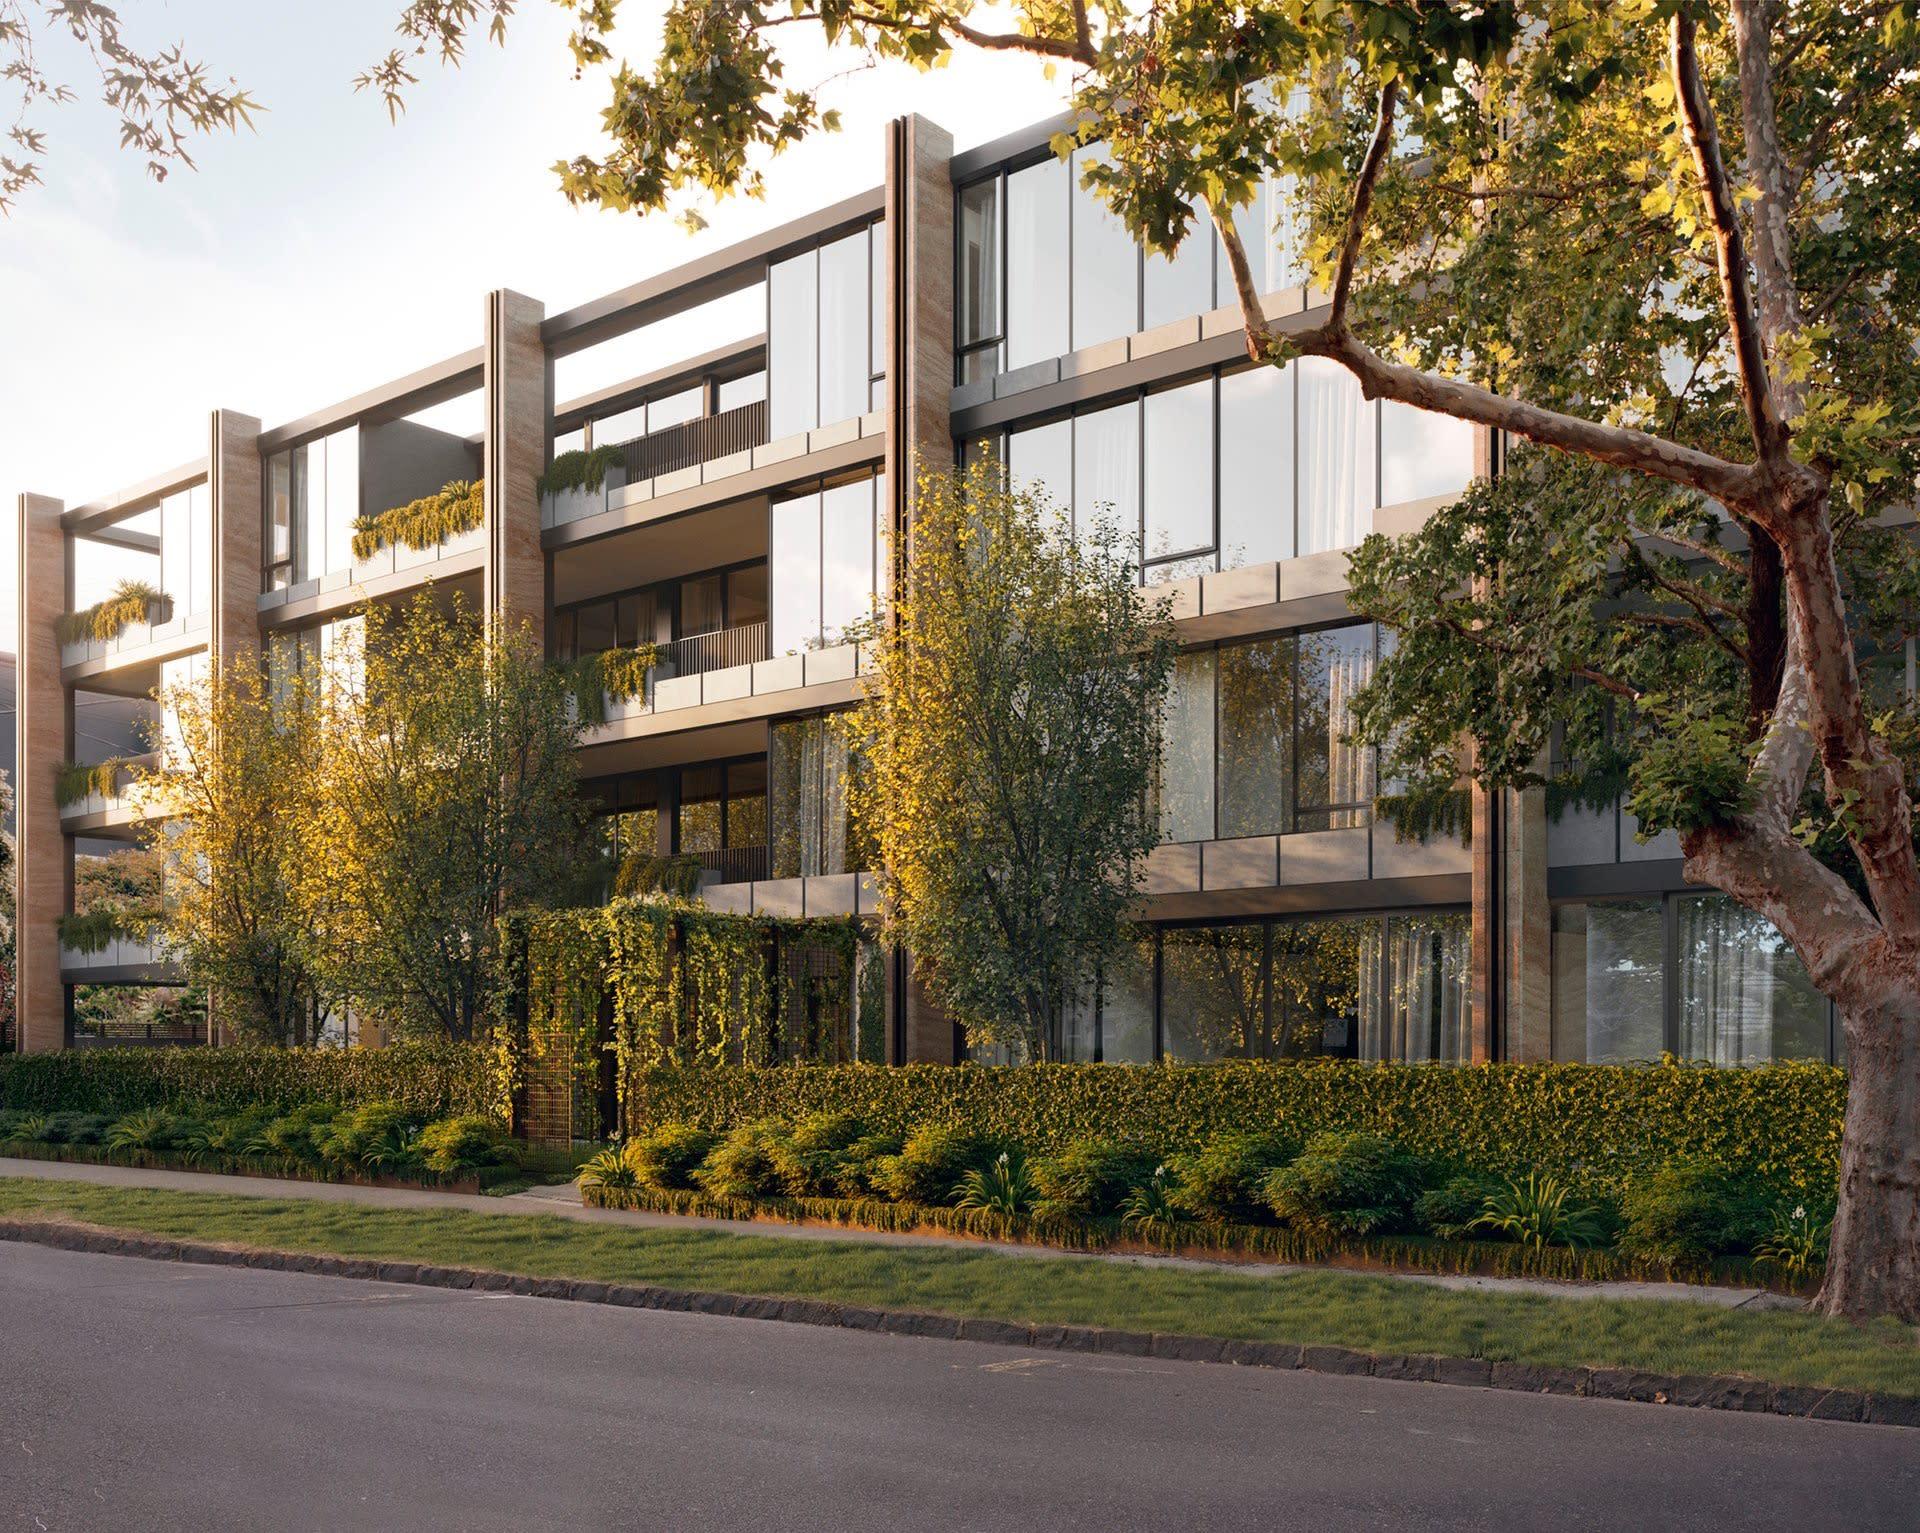 Eckersley Garden Architecture shares inspiration behind the design of Hurstmon's garden areas